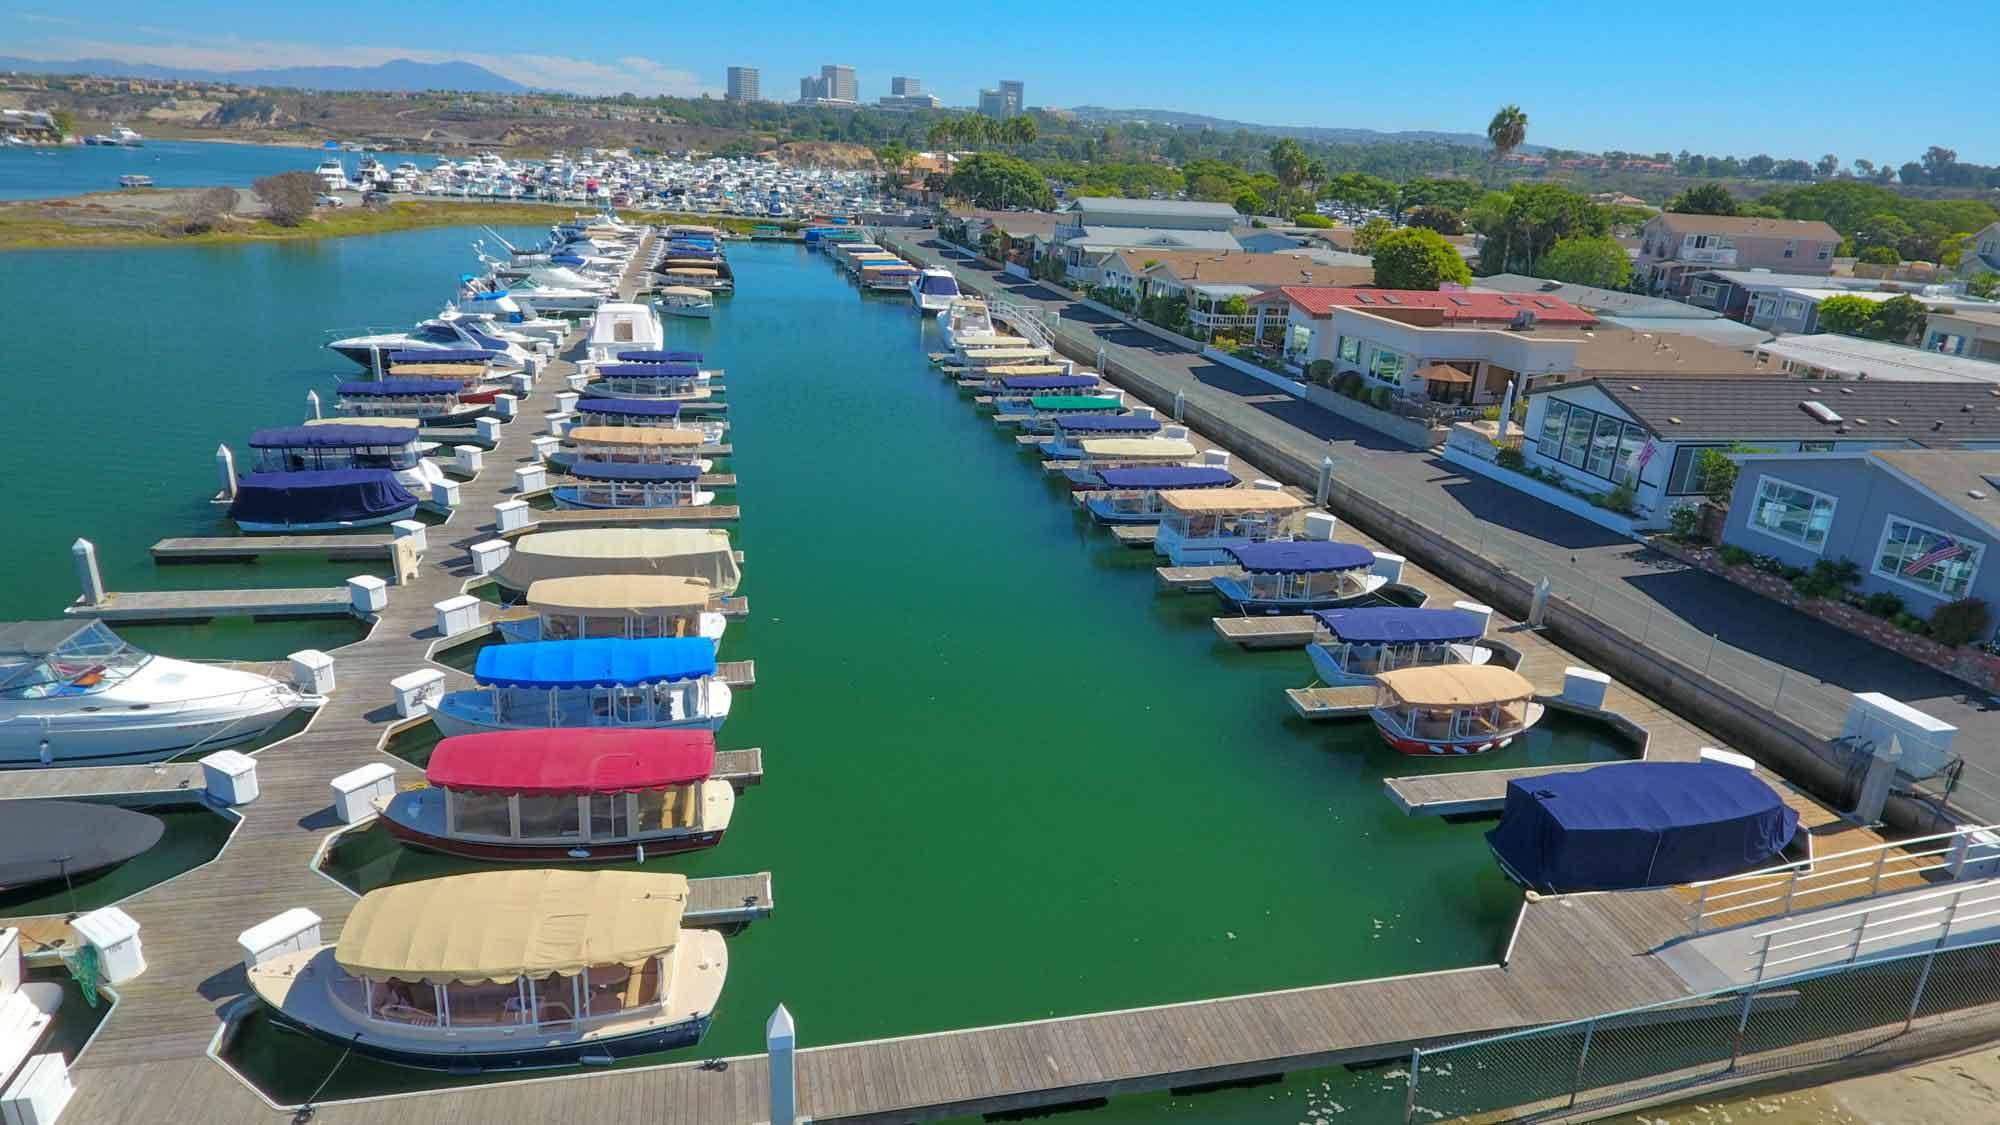 Duffy Boats rental2